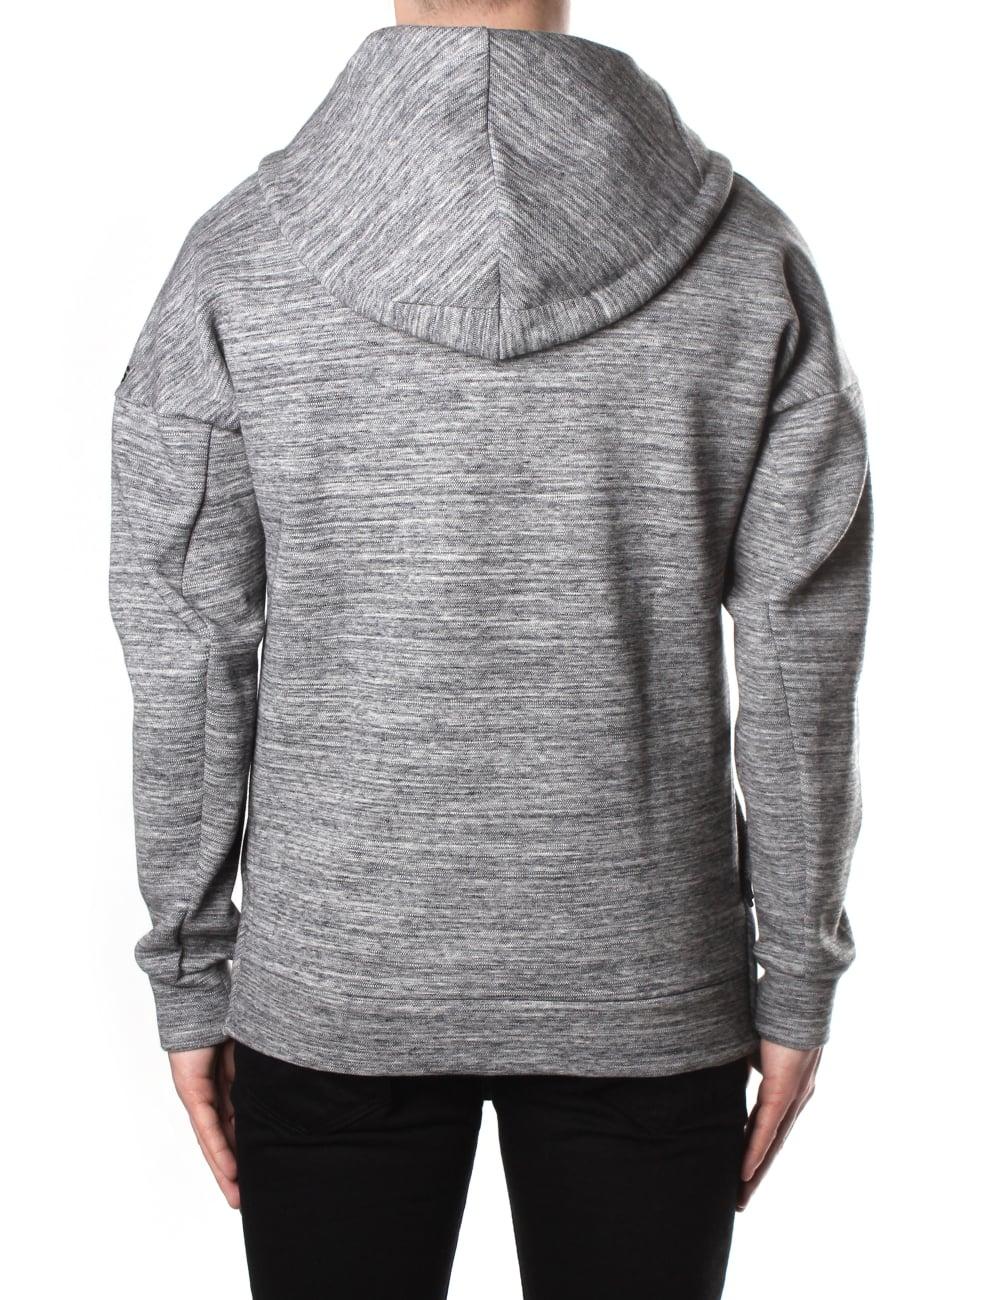 Adidas Men's Z.N.E Travel Hoodie